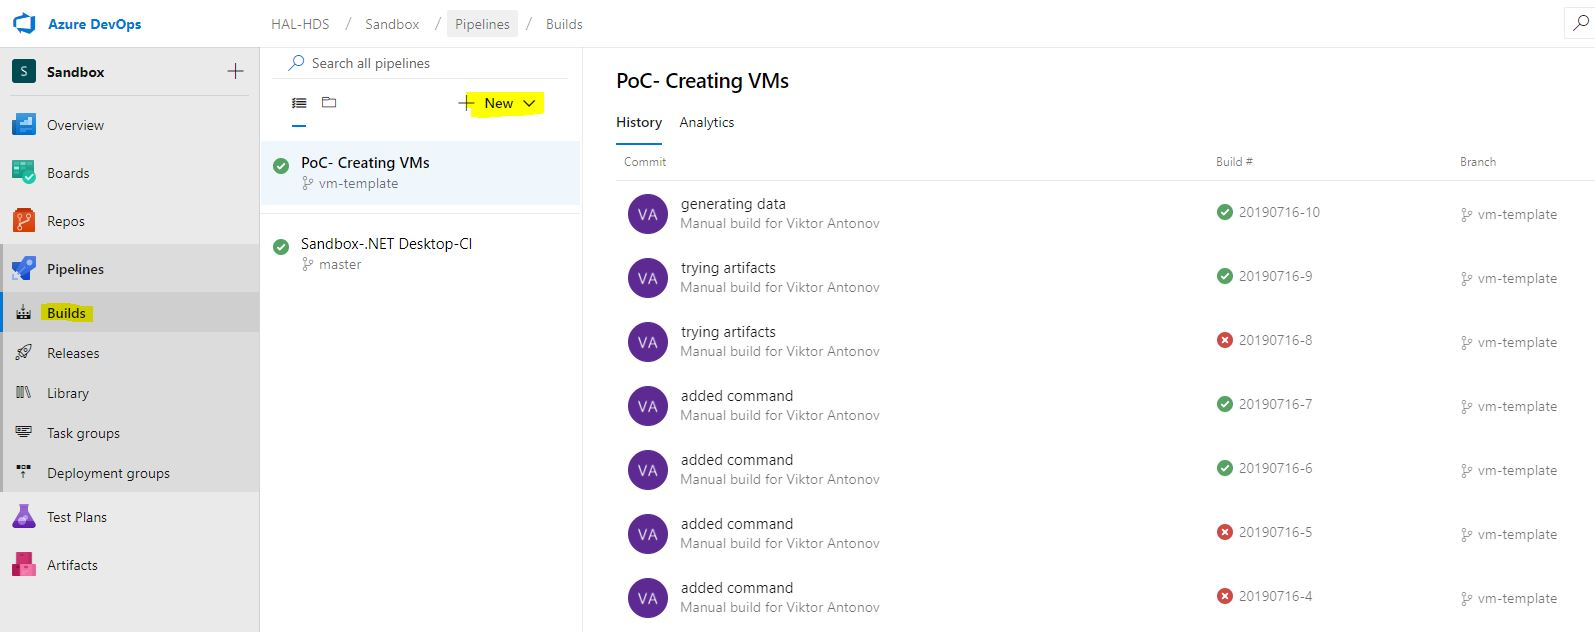 Строим пайплайн автоматизированного тестирования на Azure DevOps - 7